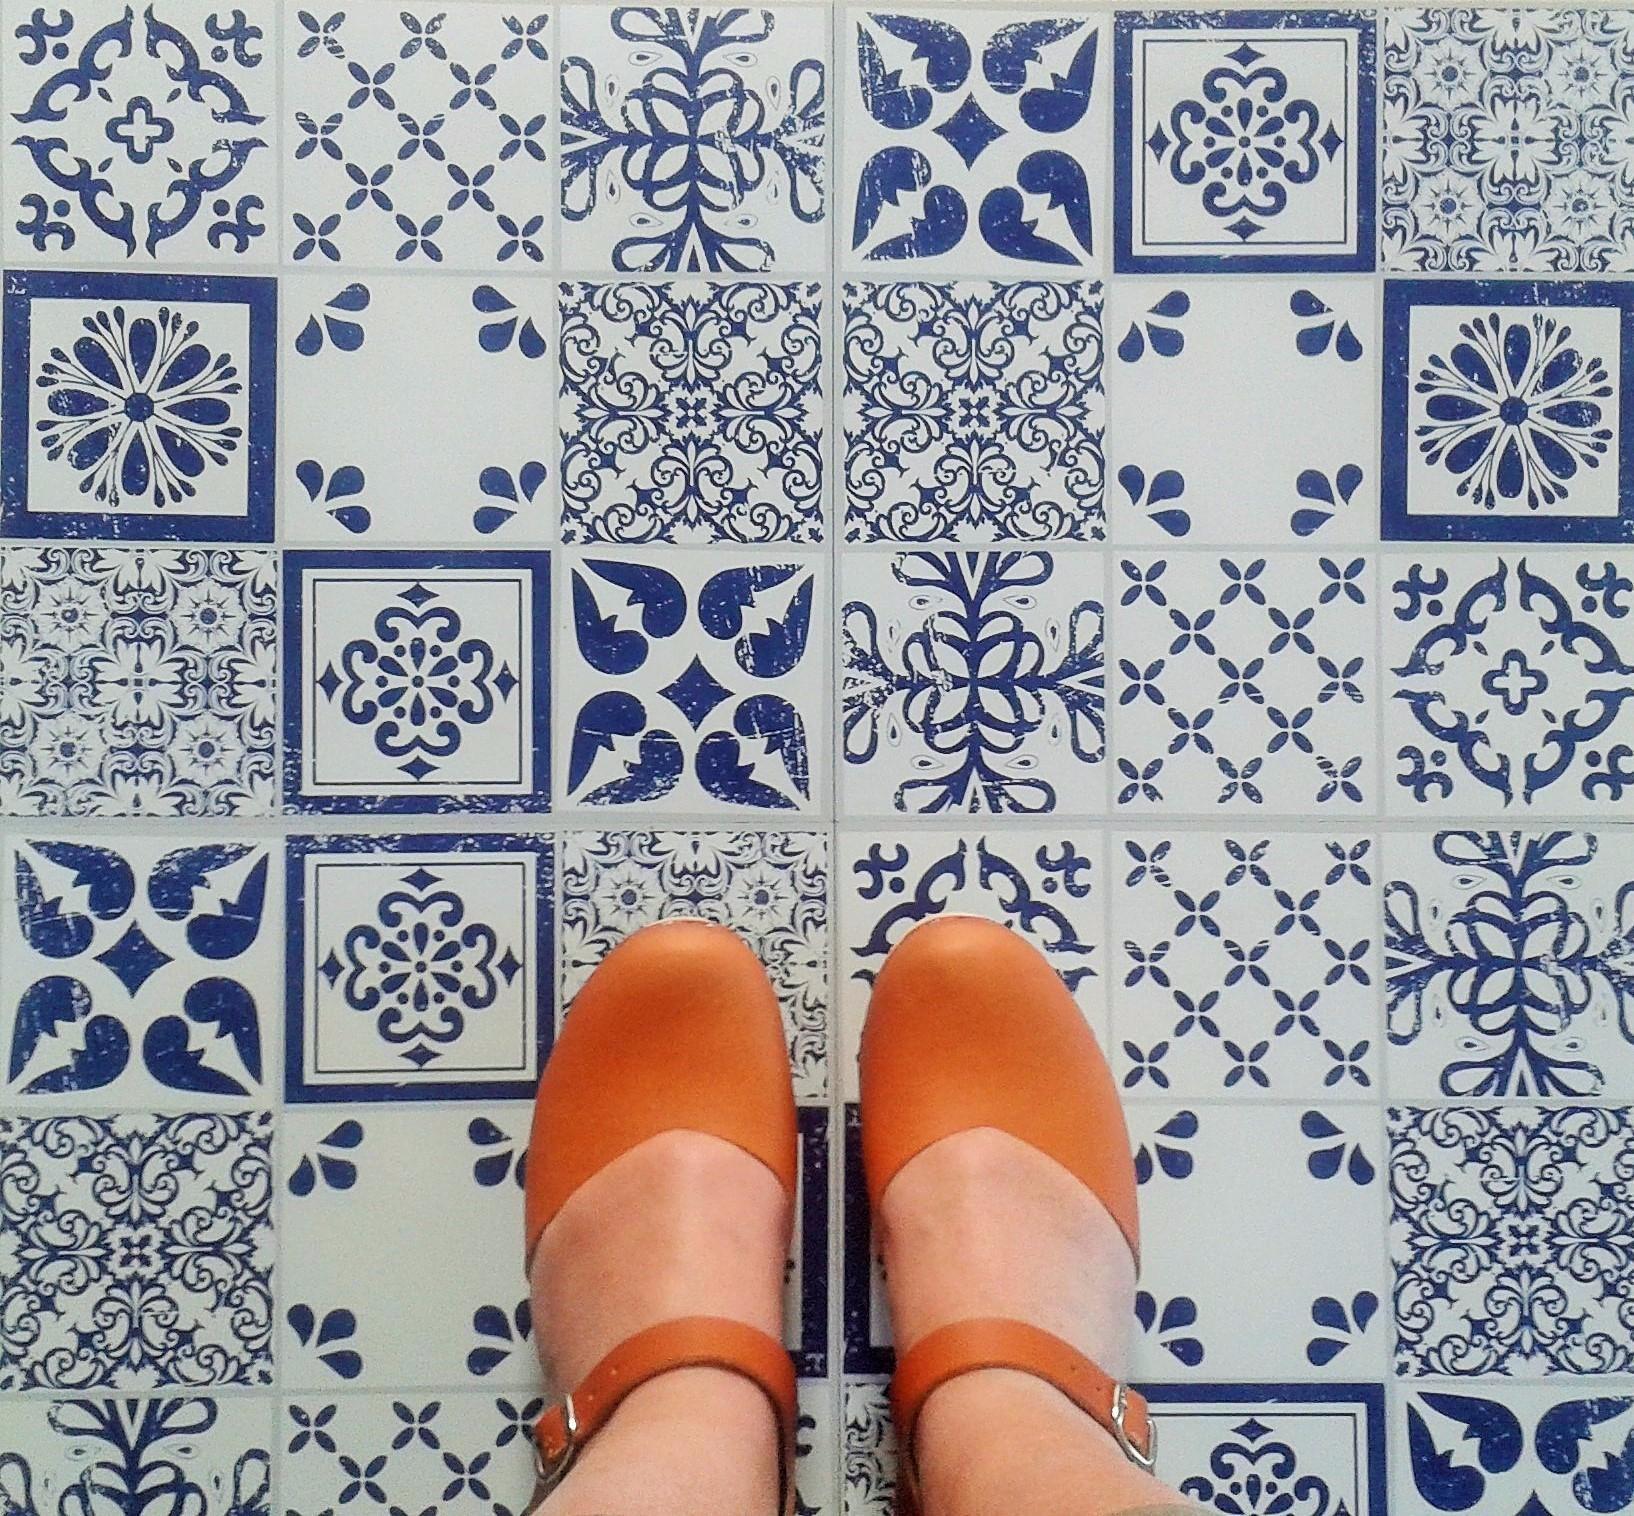 Azulejos Vinyl Flooring Portugese Vinyl Floor Tiles For Your Home With Images White Vinyl Flooring Vinyl Flooring Retro Vinyl Flooring